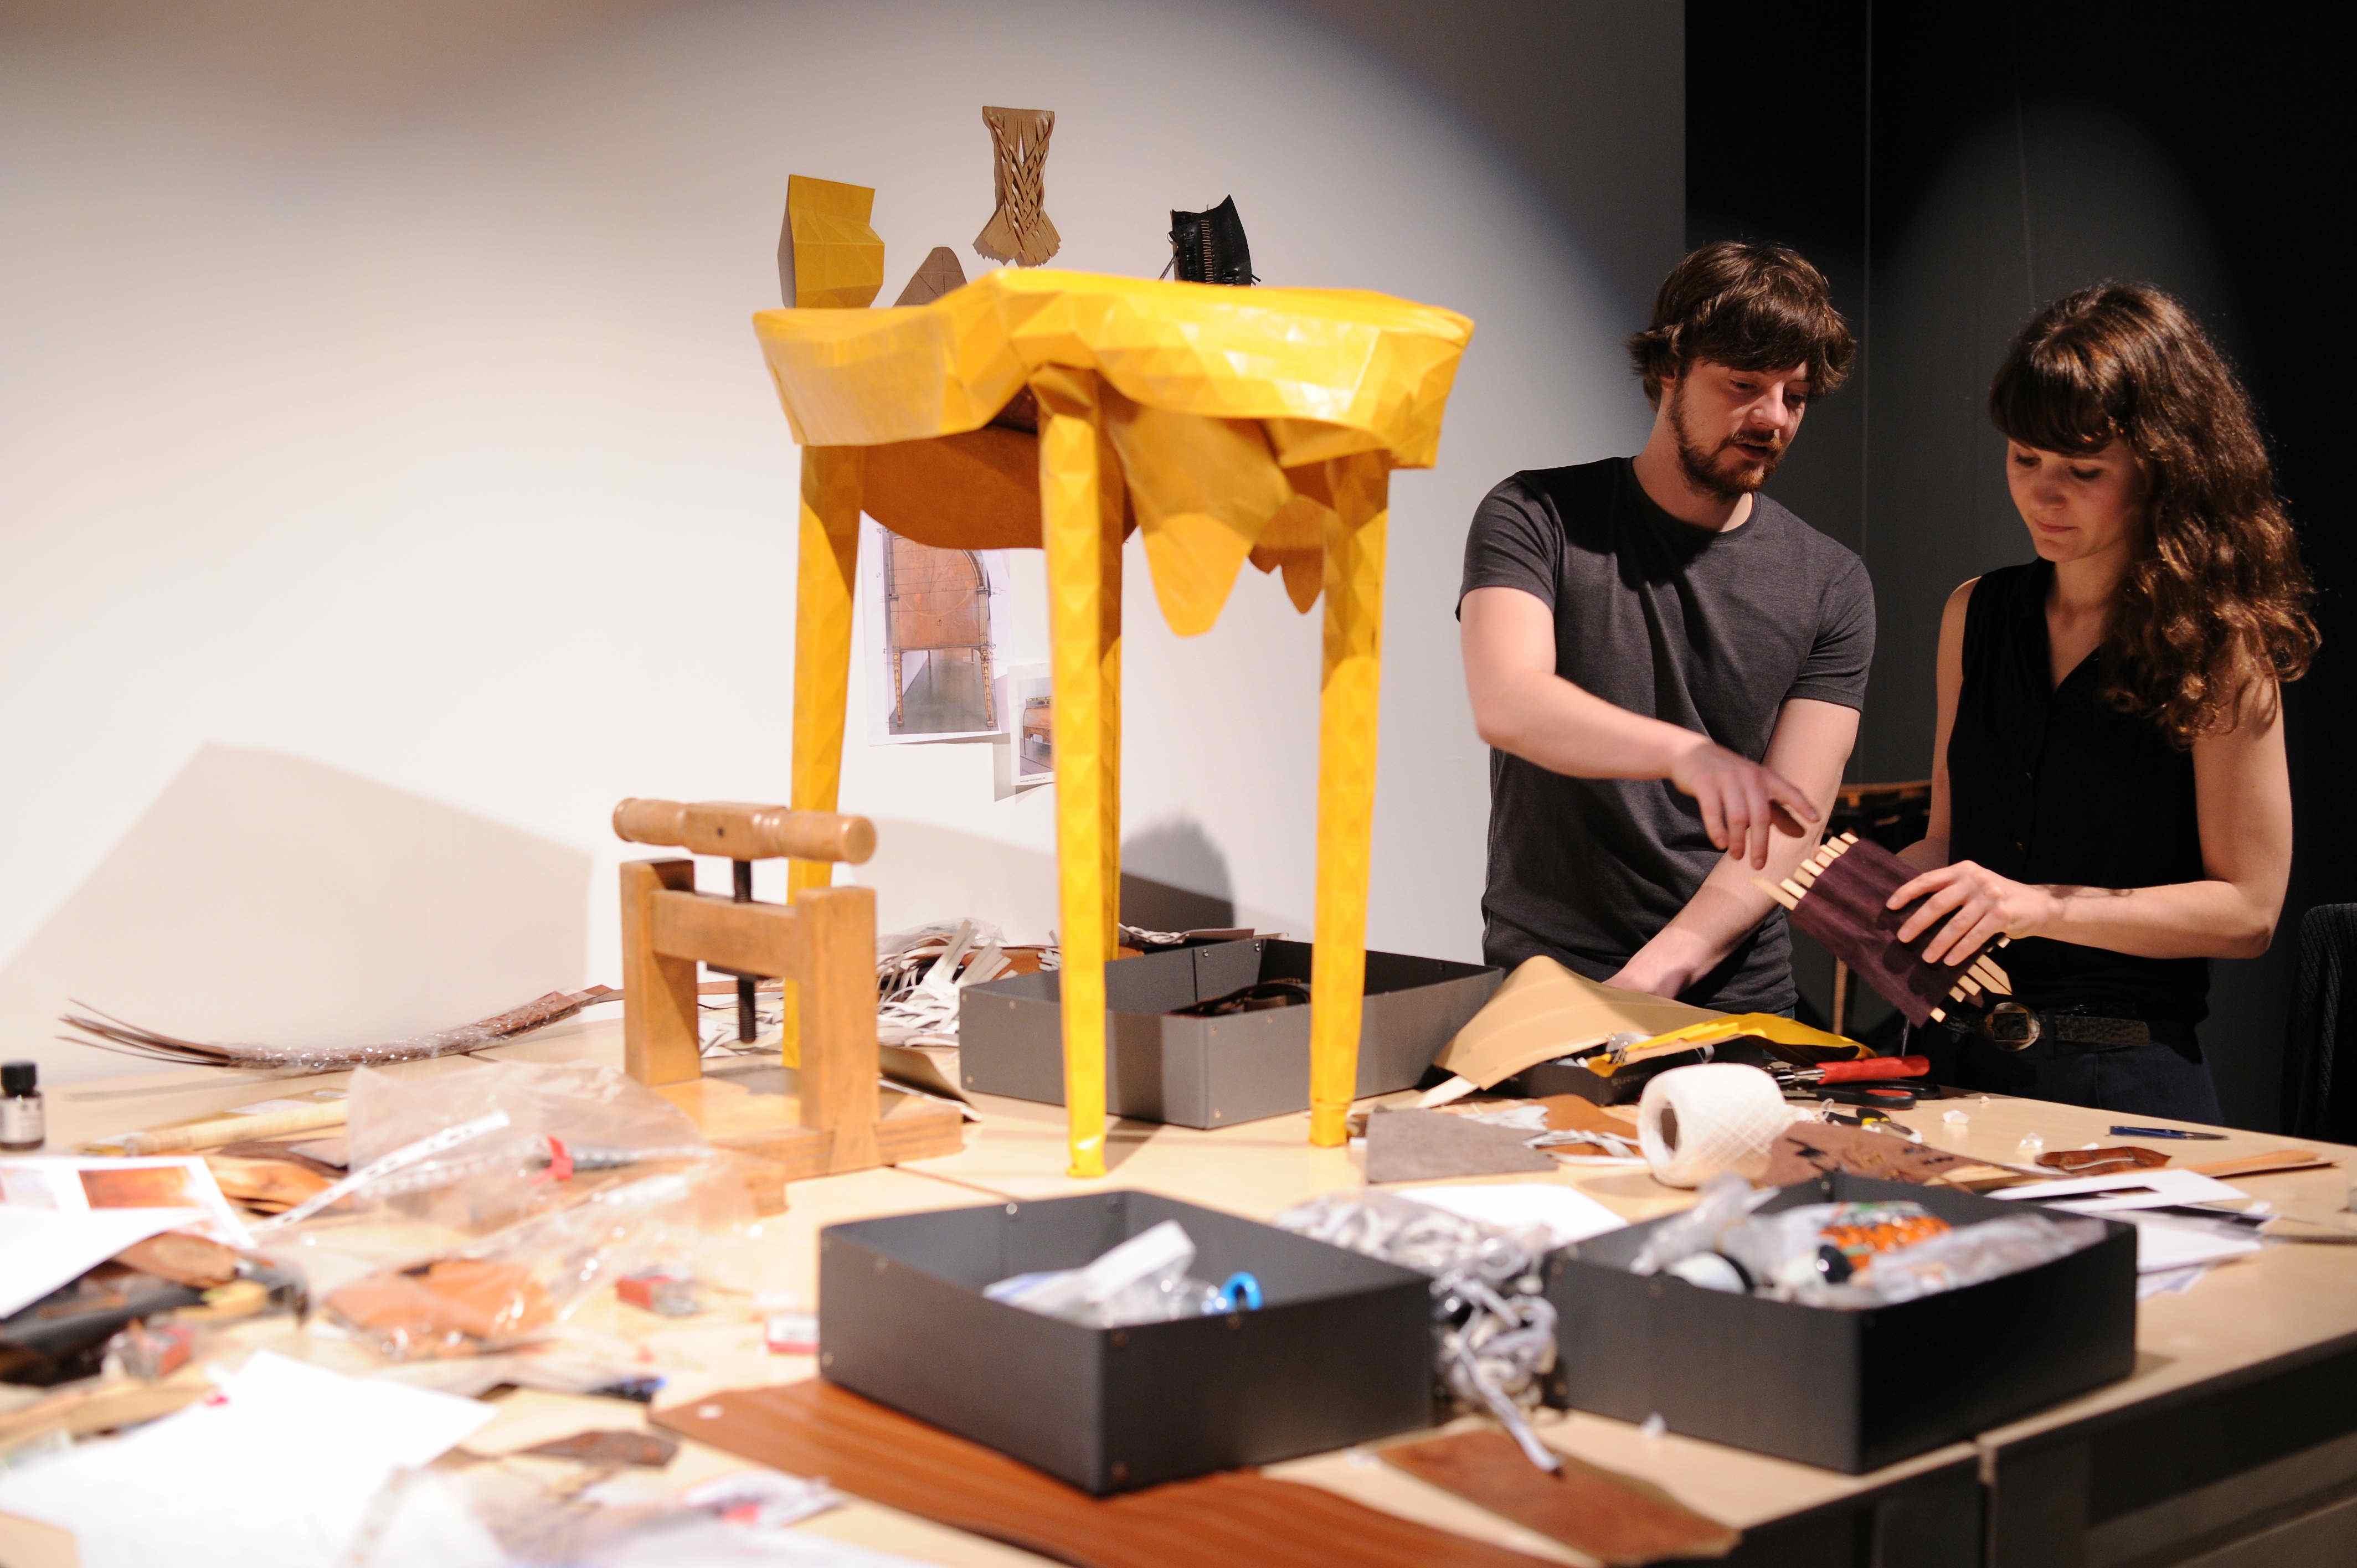 FENDI Design Miami Craft Alchemy_Elisa Strozyk and Sebastian Neeb at work 5